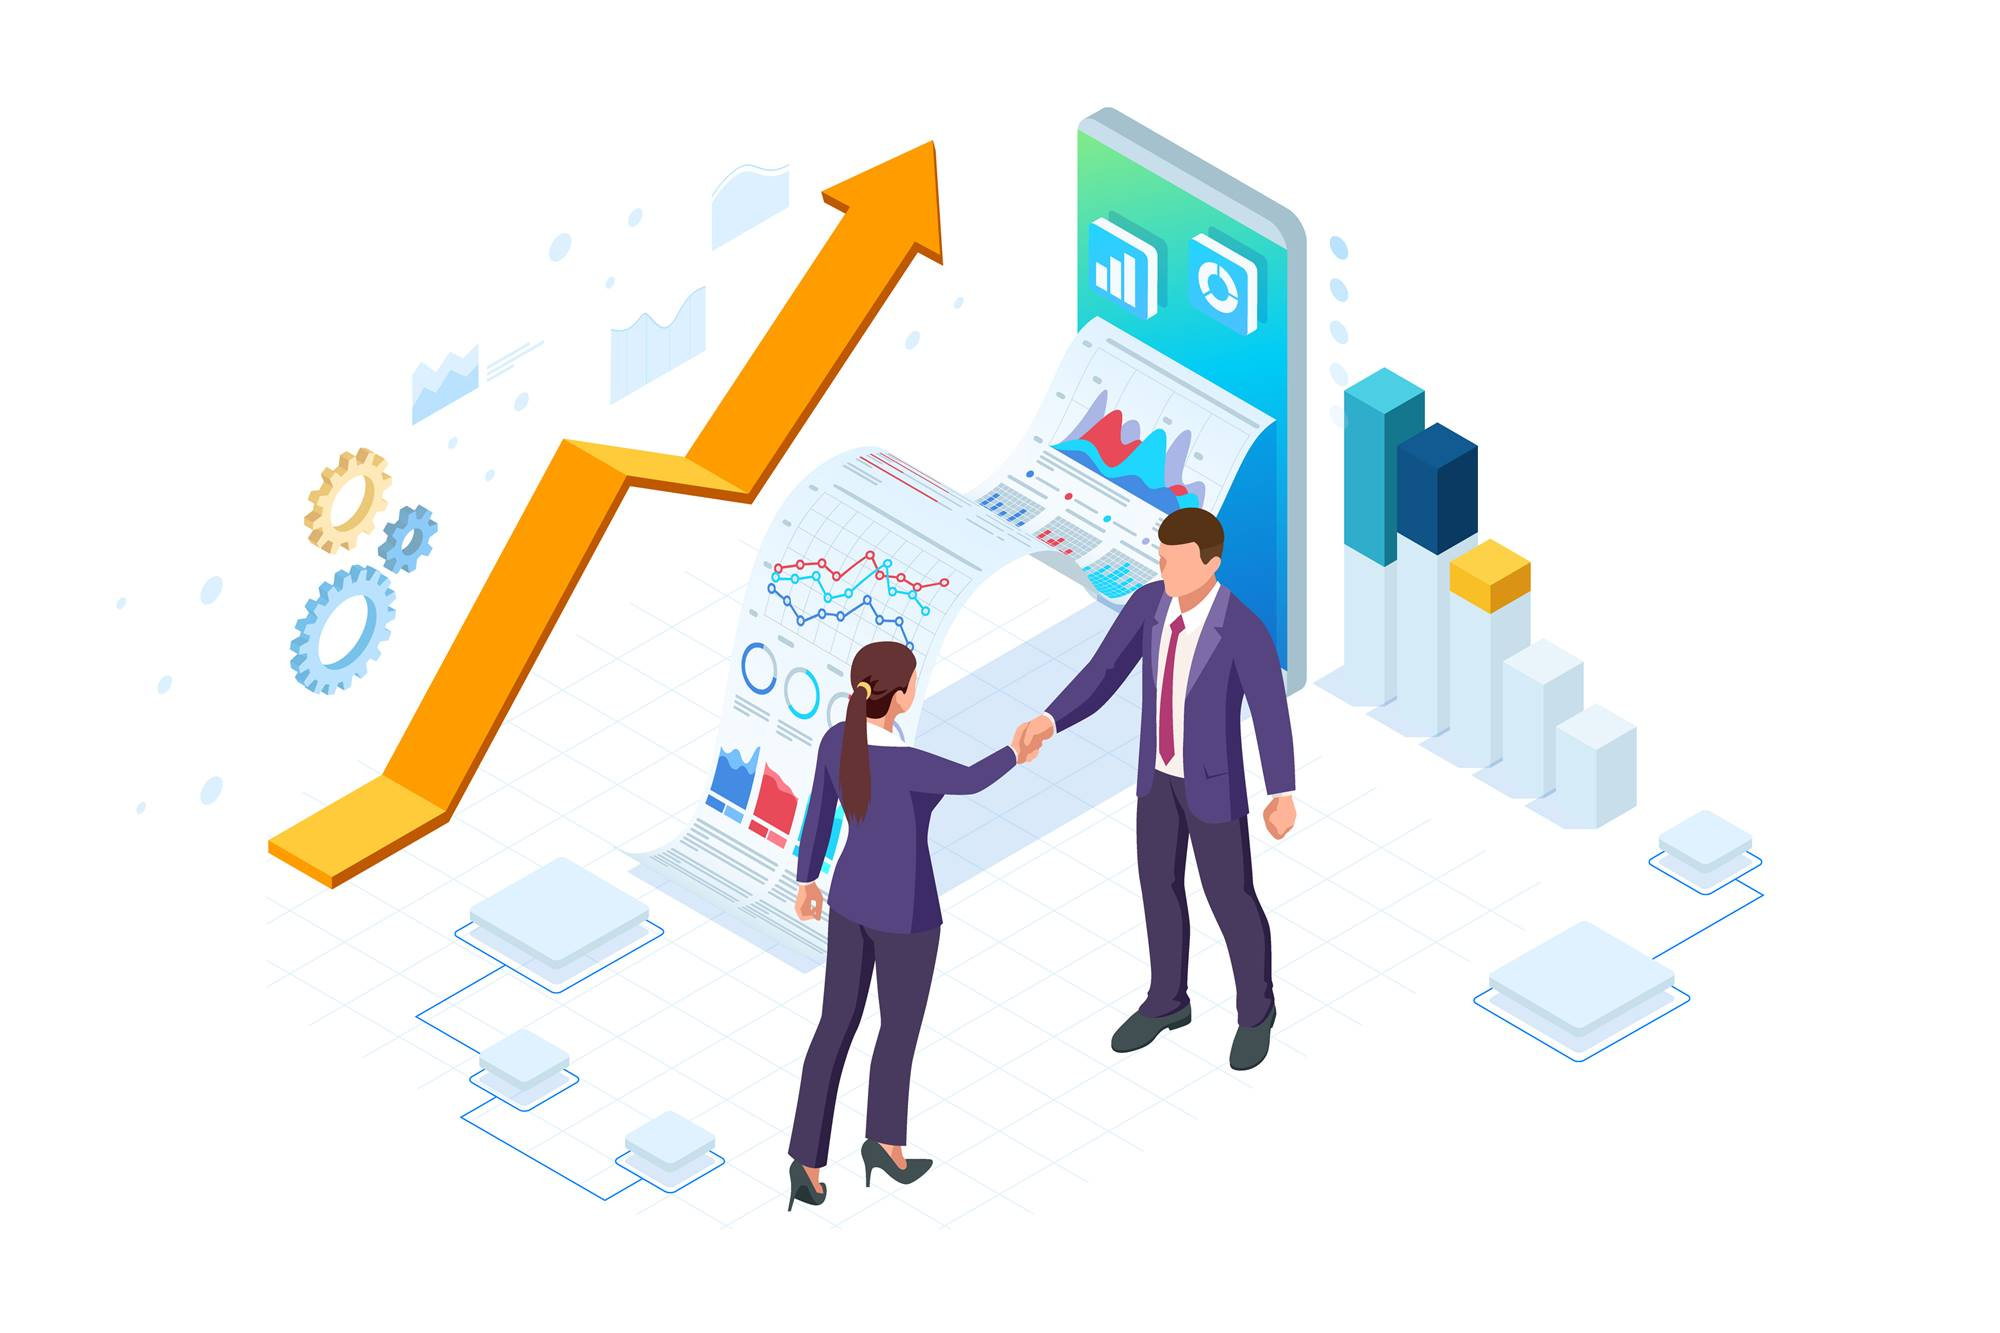 Isometric Business to Business Marketing, B2B Solution, business marketing concept. Two business partners shaking hands.